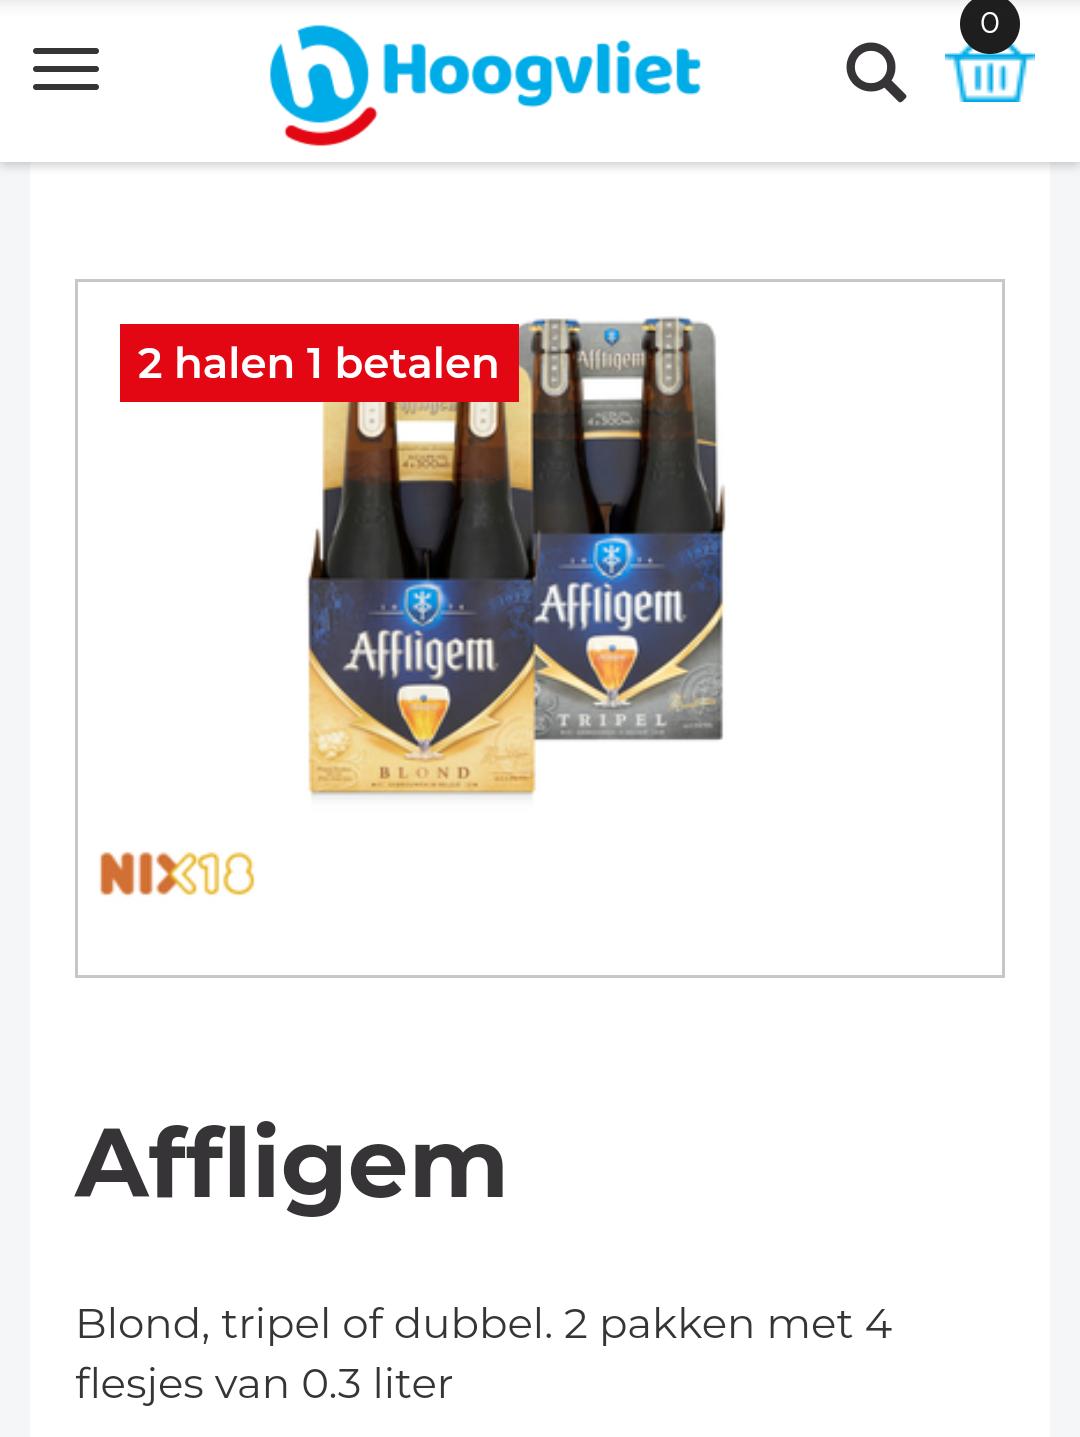 [Hoogvliet] Affligem bier 1+1 gratis